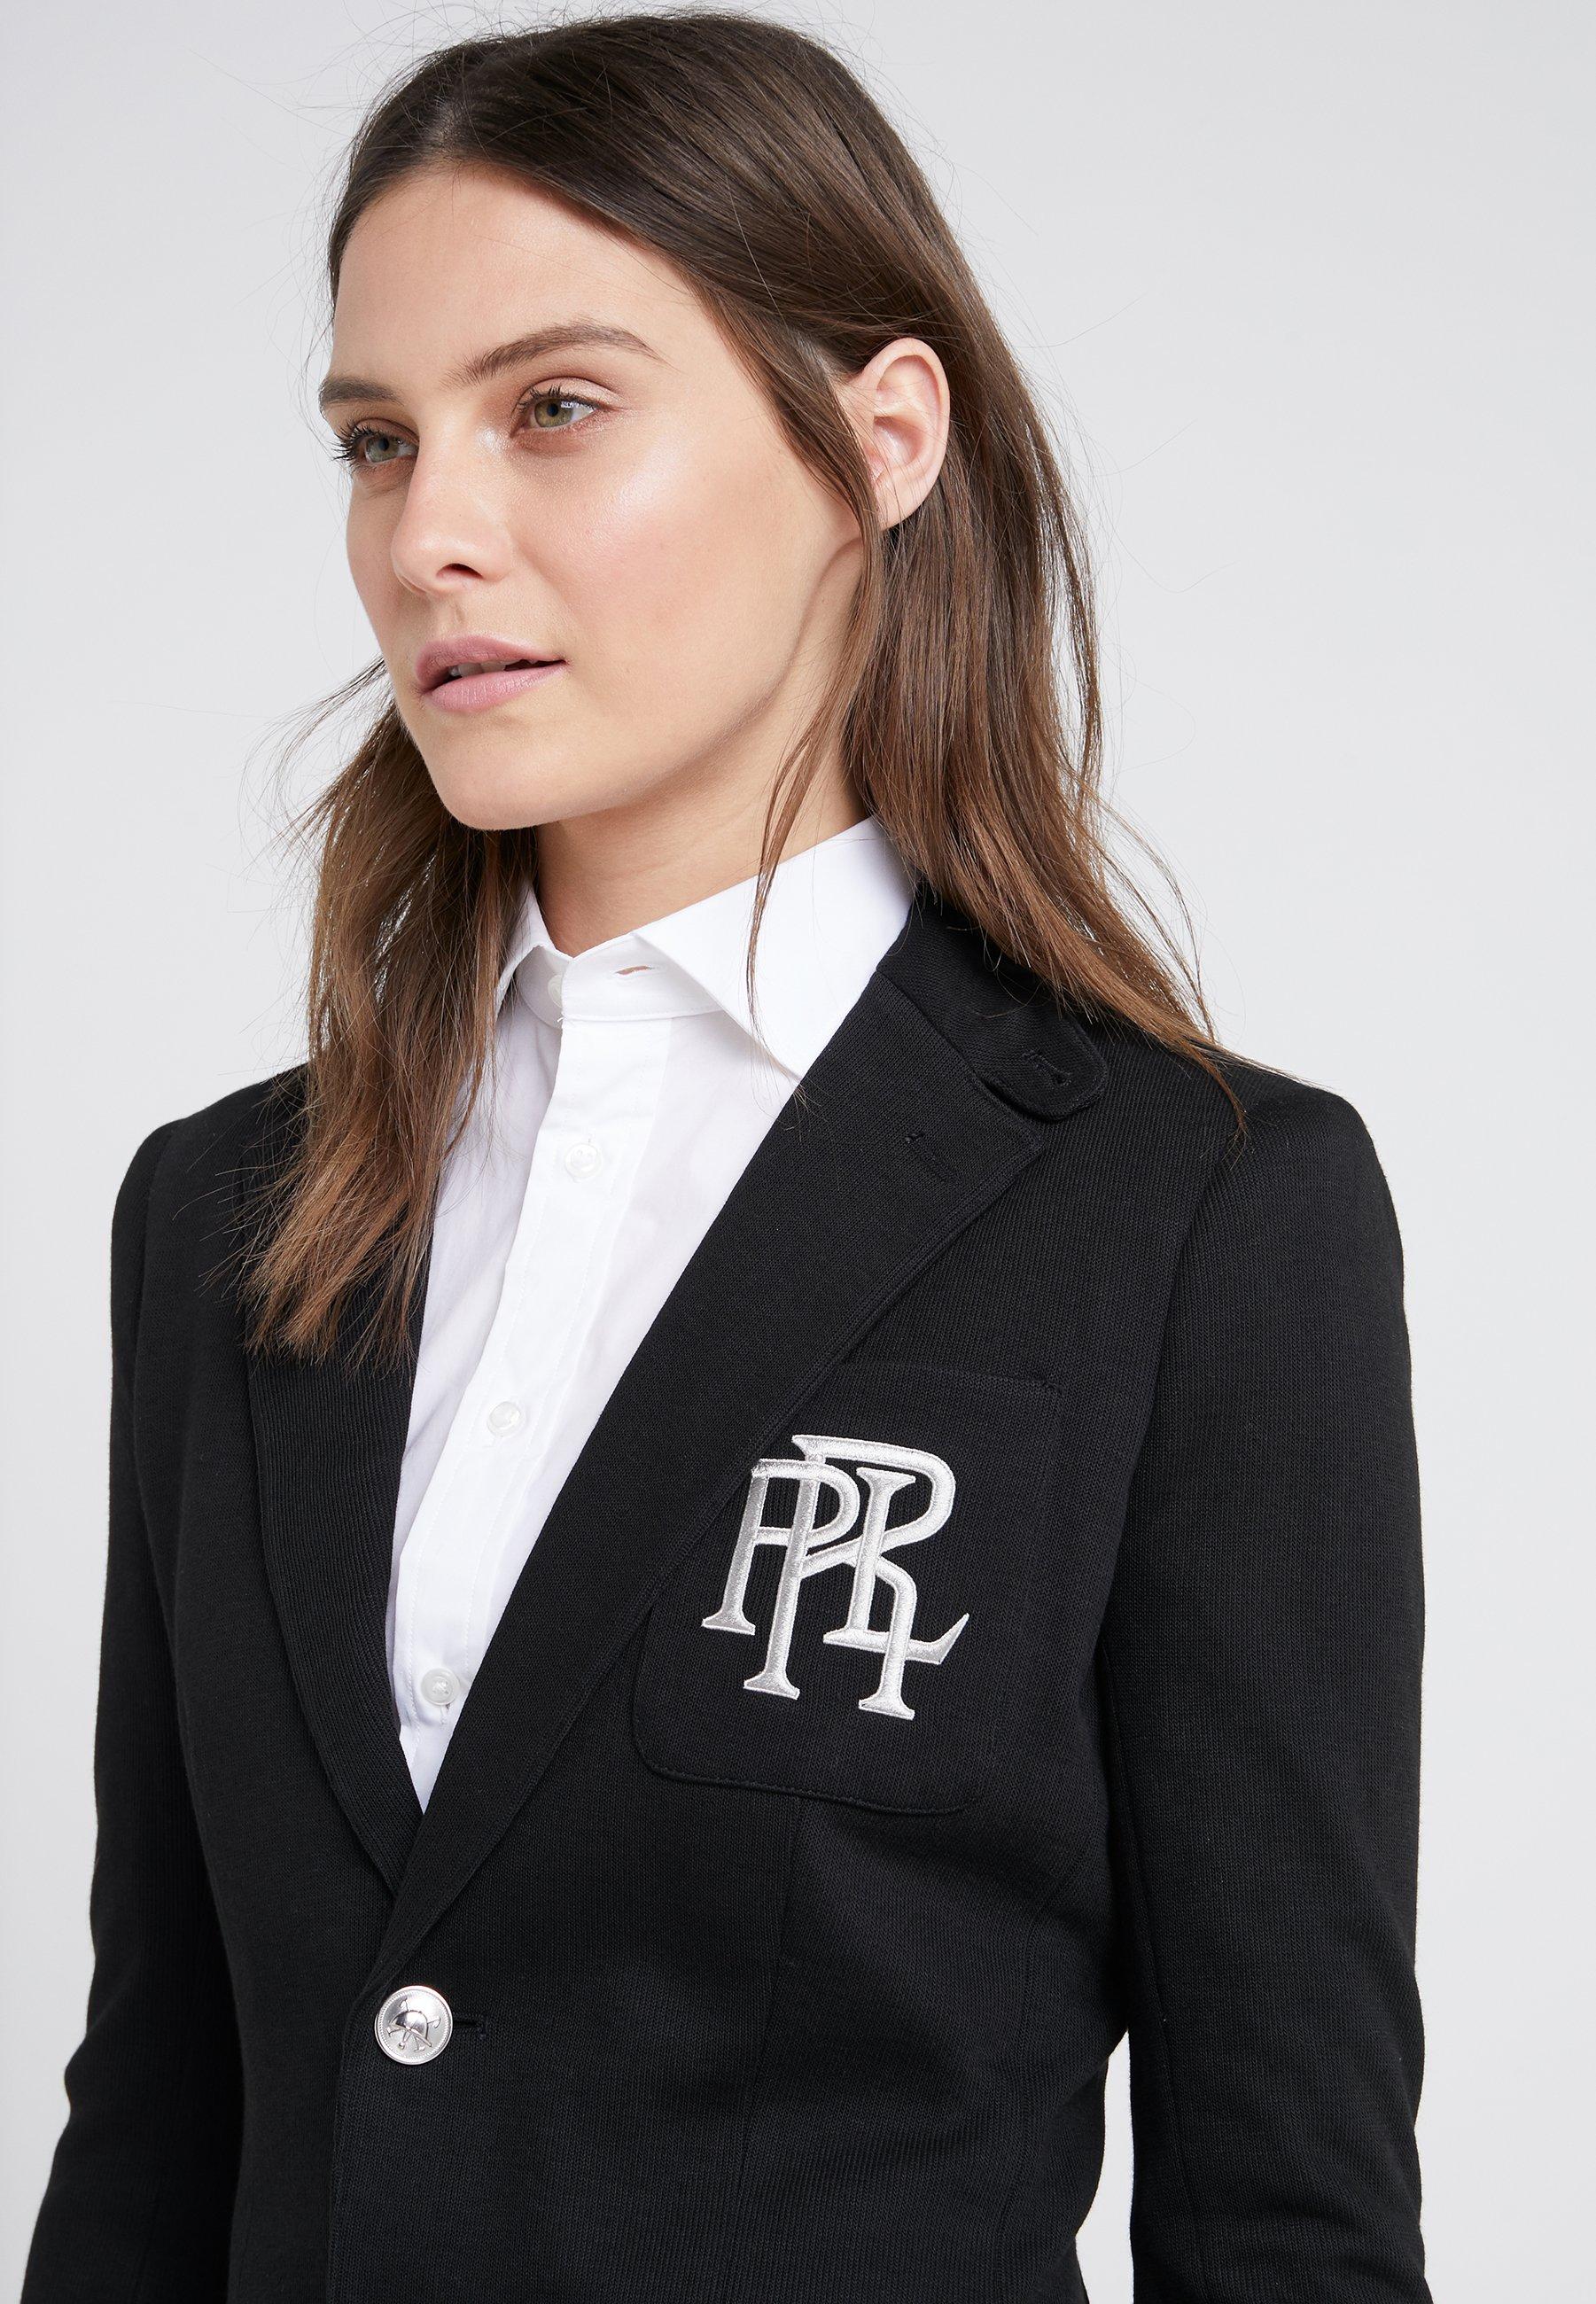 Polo Ralph Lauren Blazer - Black mV3jc